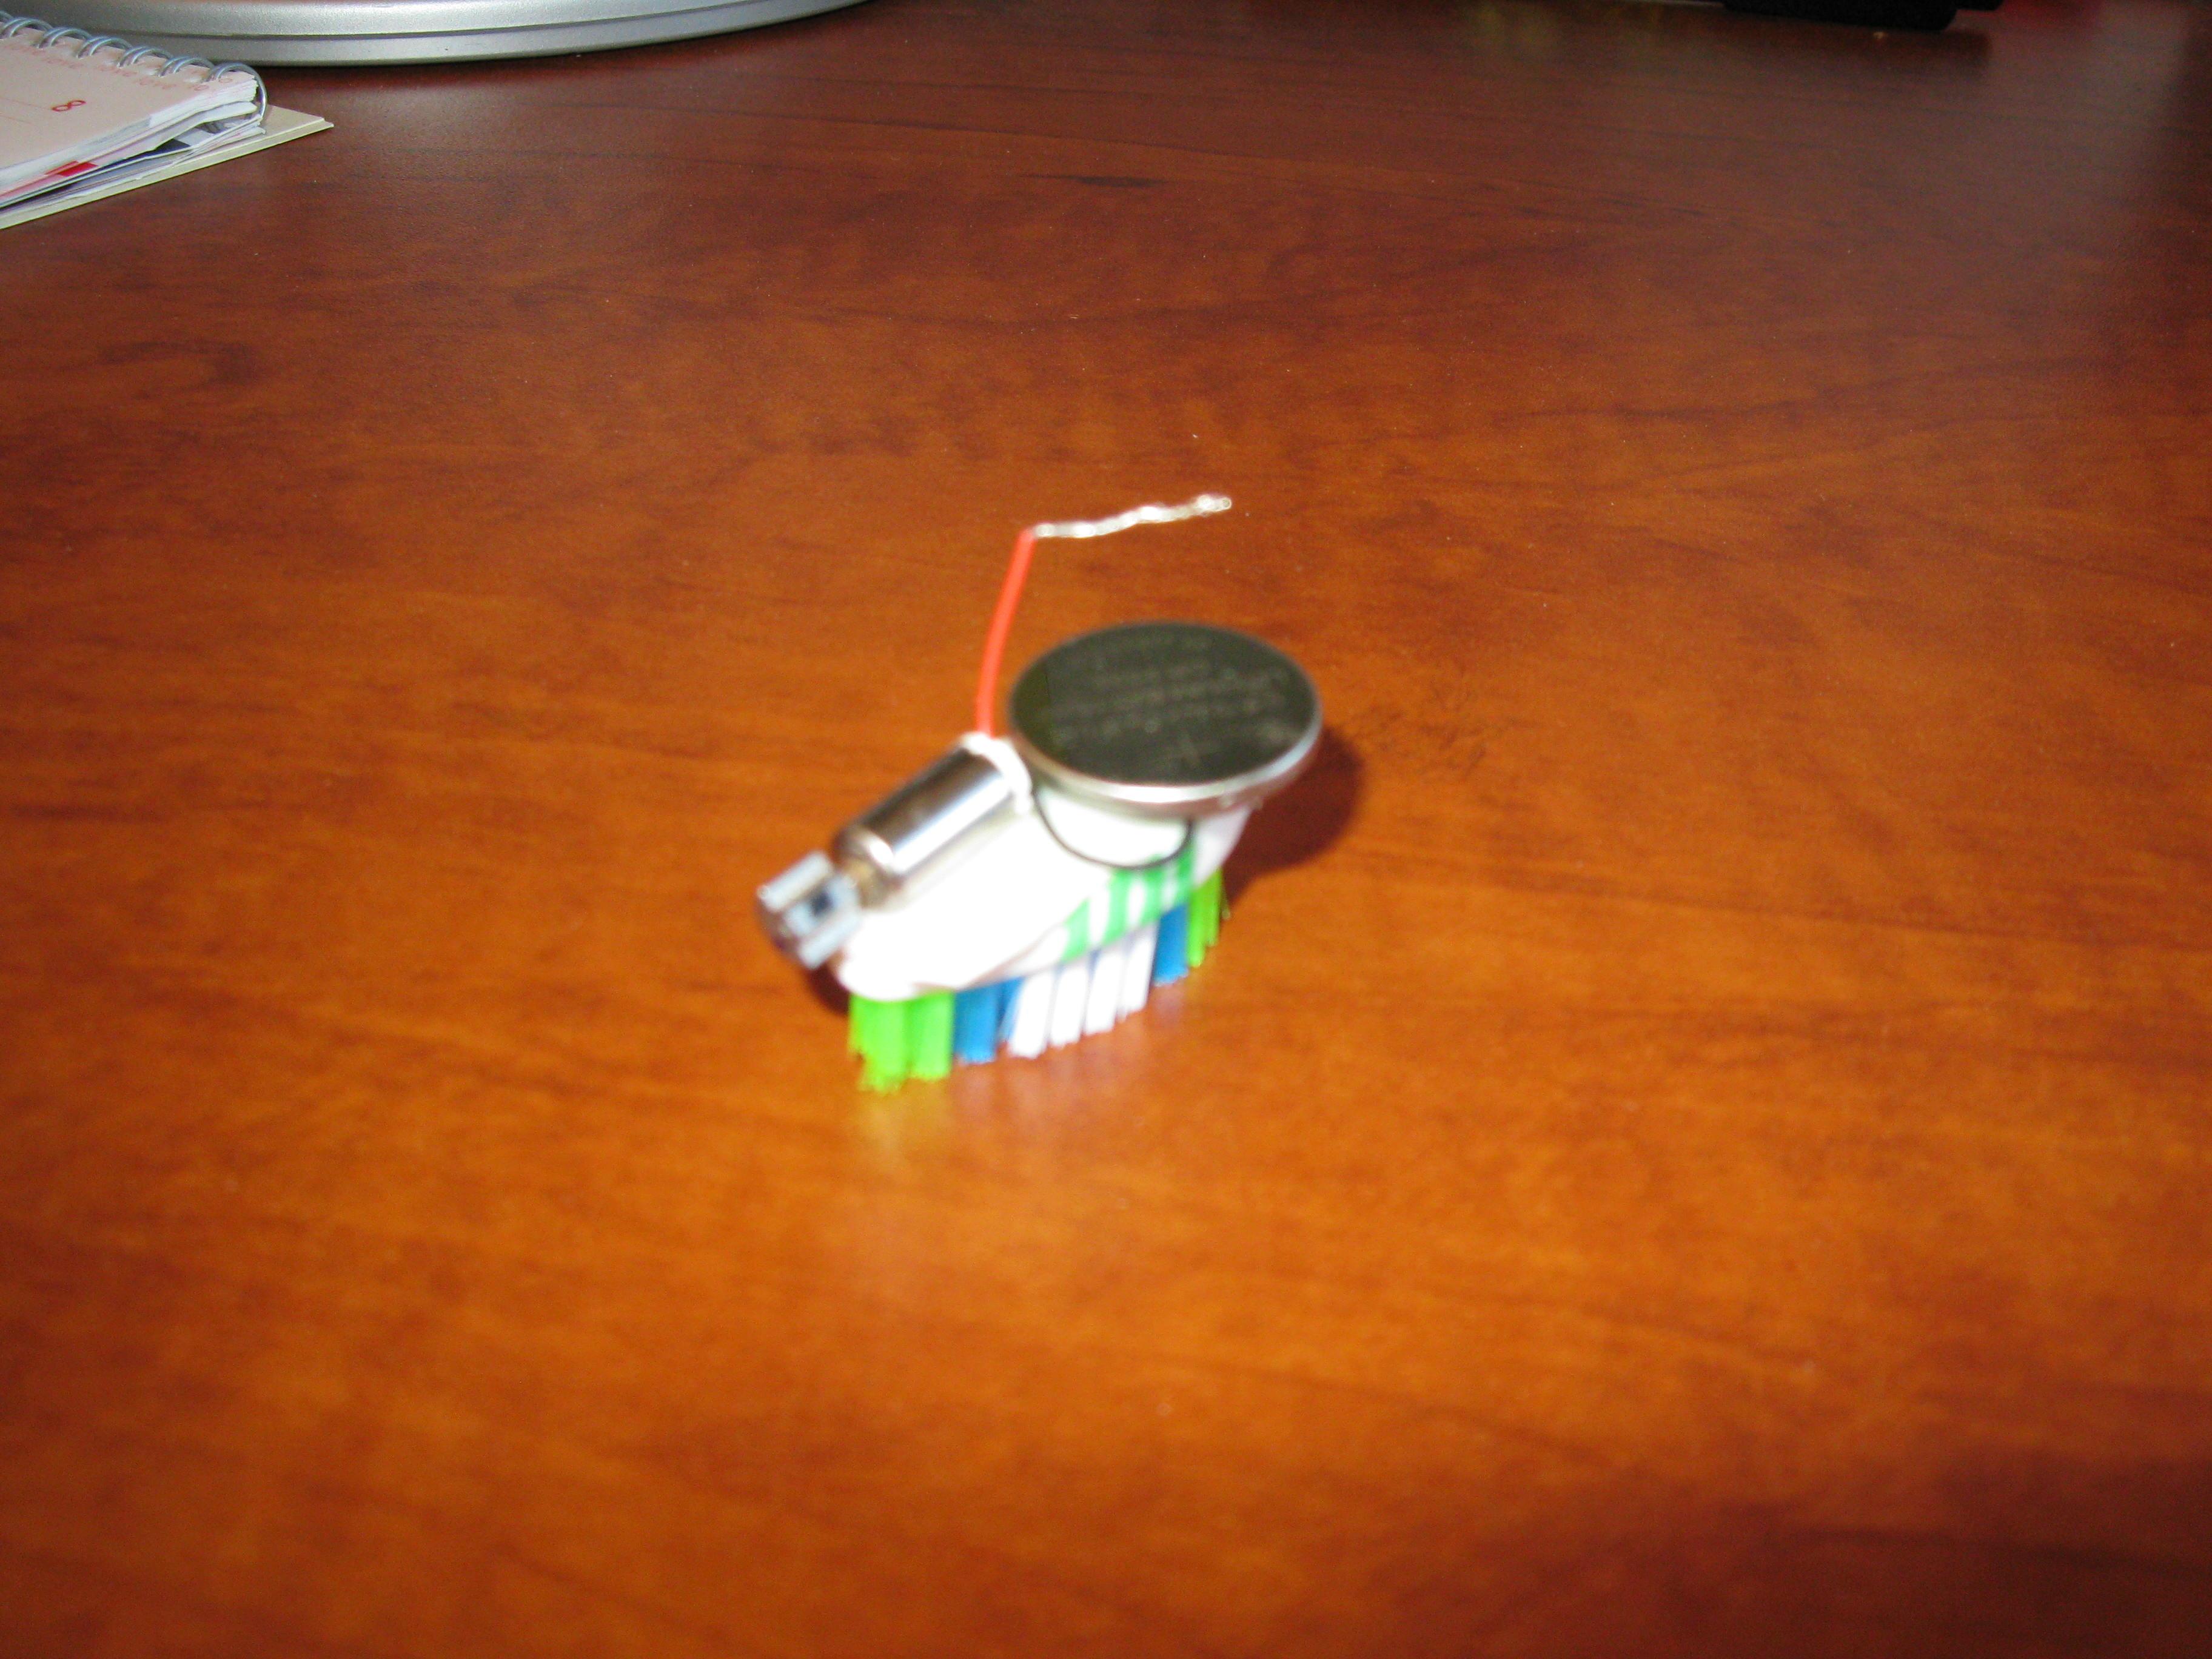 How to make a pocket-sized bristlebot